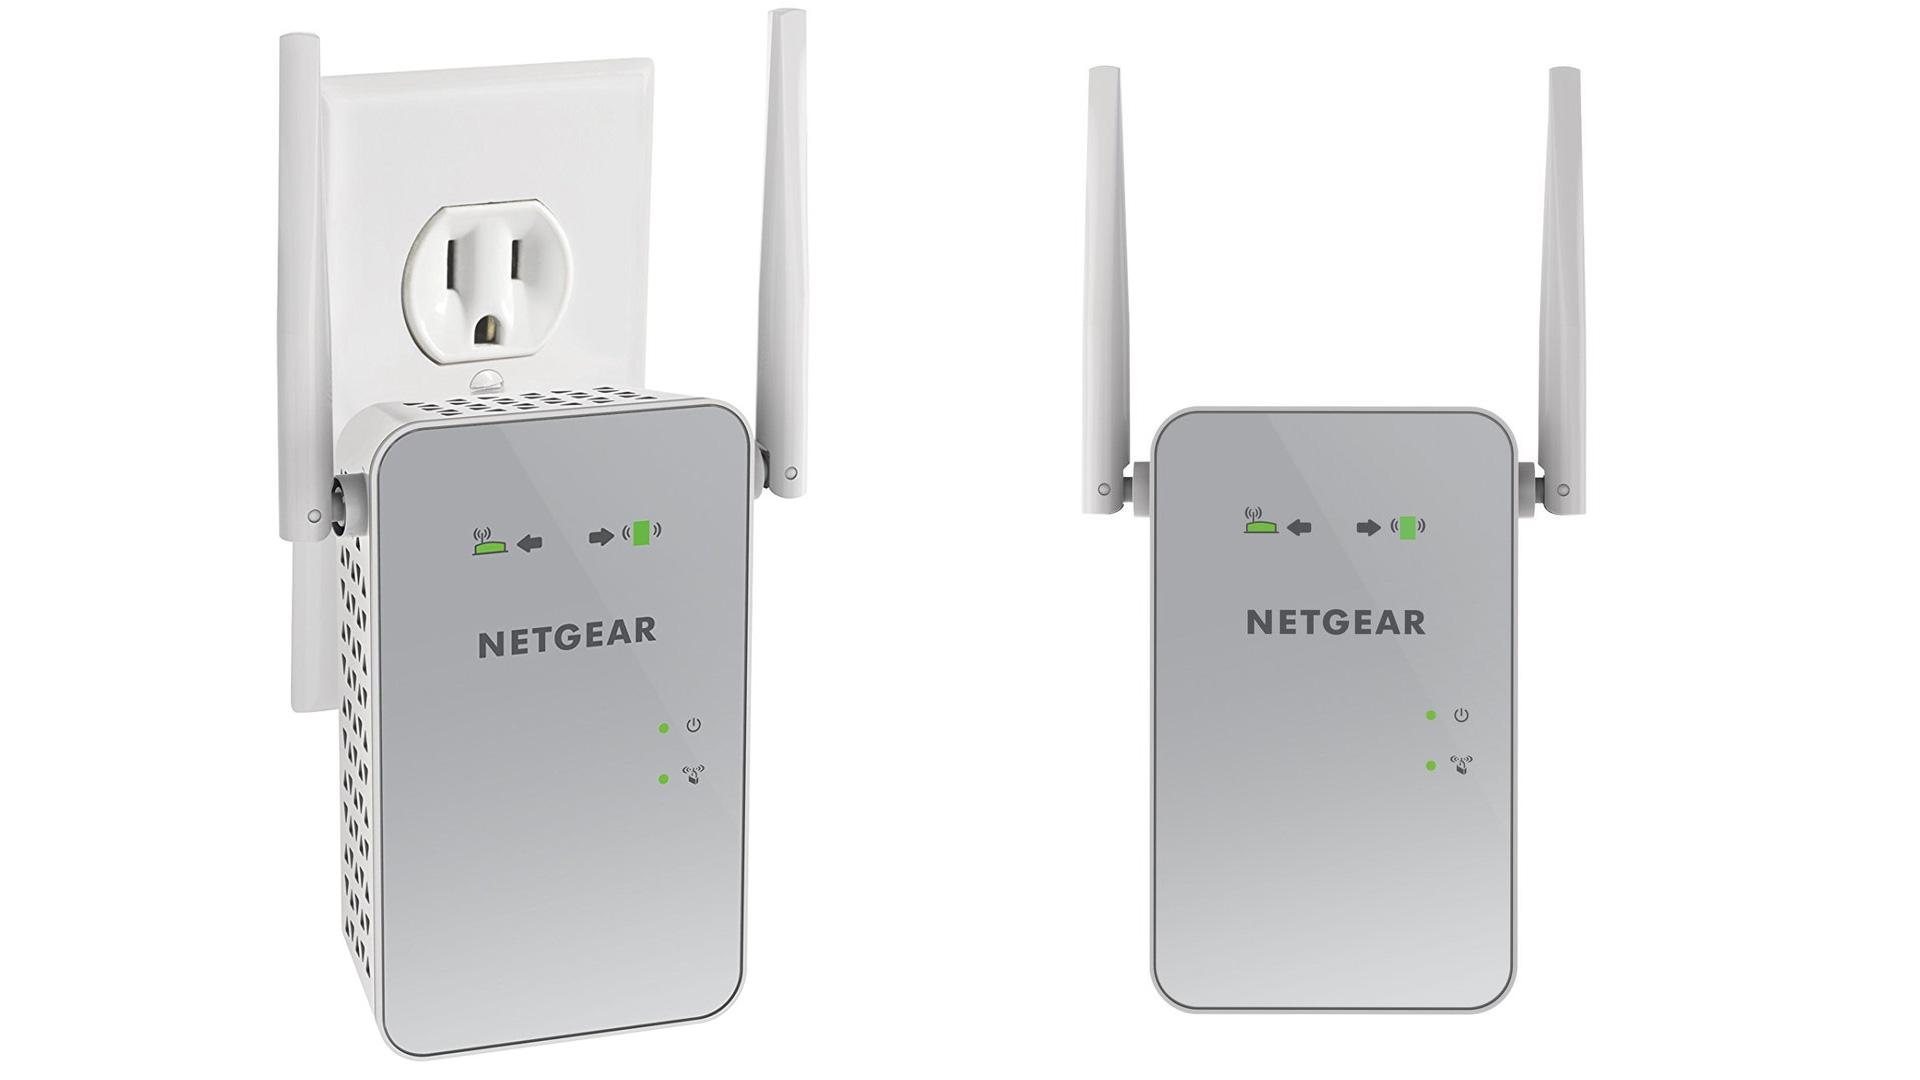 Expand your Wi-Fi network w/ a NETGEAR 802.11ac range extender: $53.50 (Reg. $100)